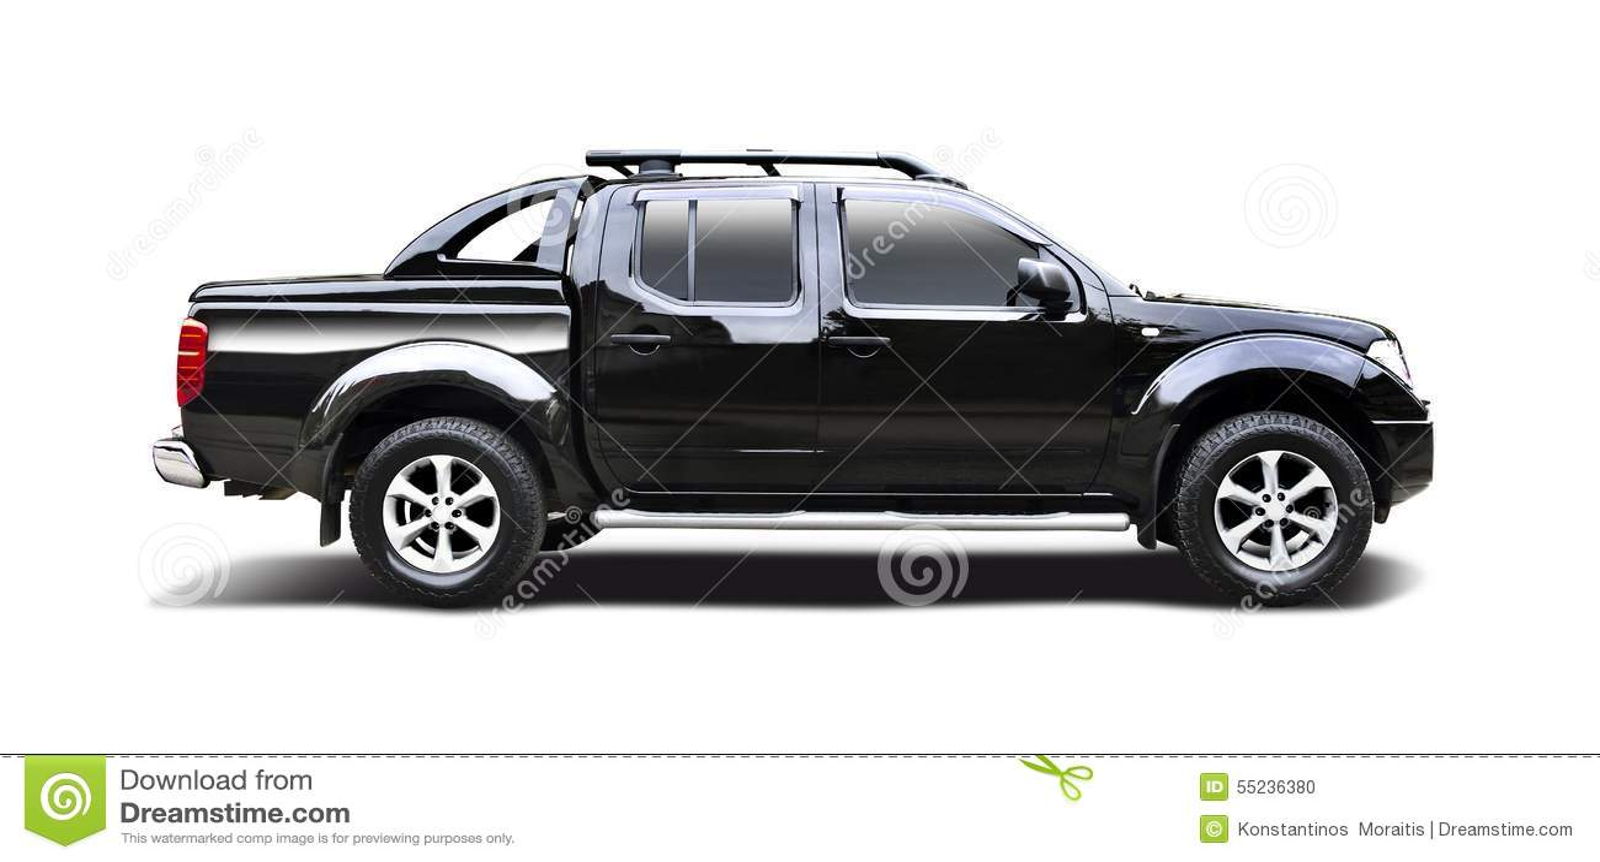 Black pick-up truck Nissan Navara isolated on white.: www.dreamstime.com/stock-photo-black-nissan-navara-pick-up-truck...